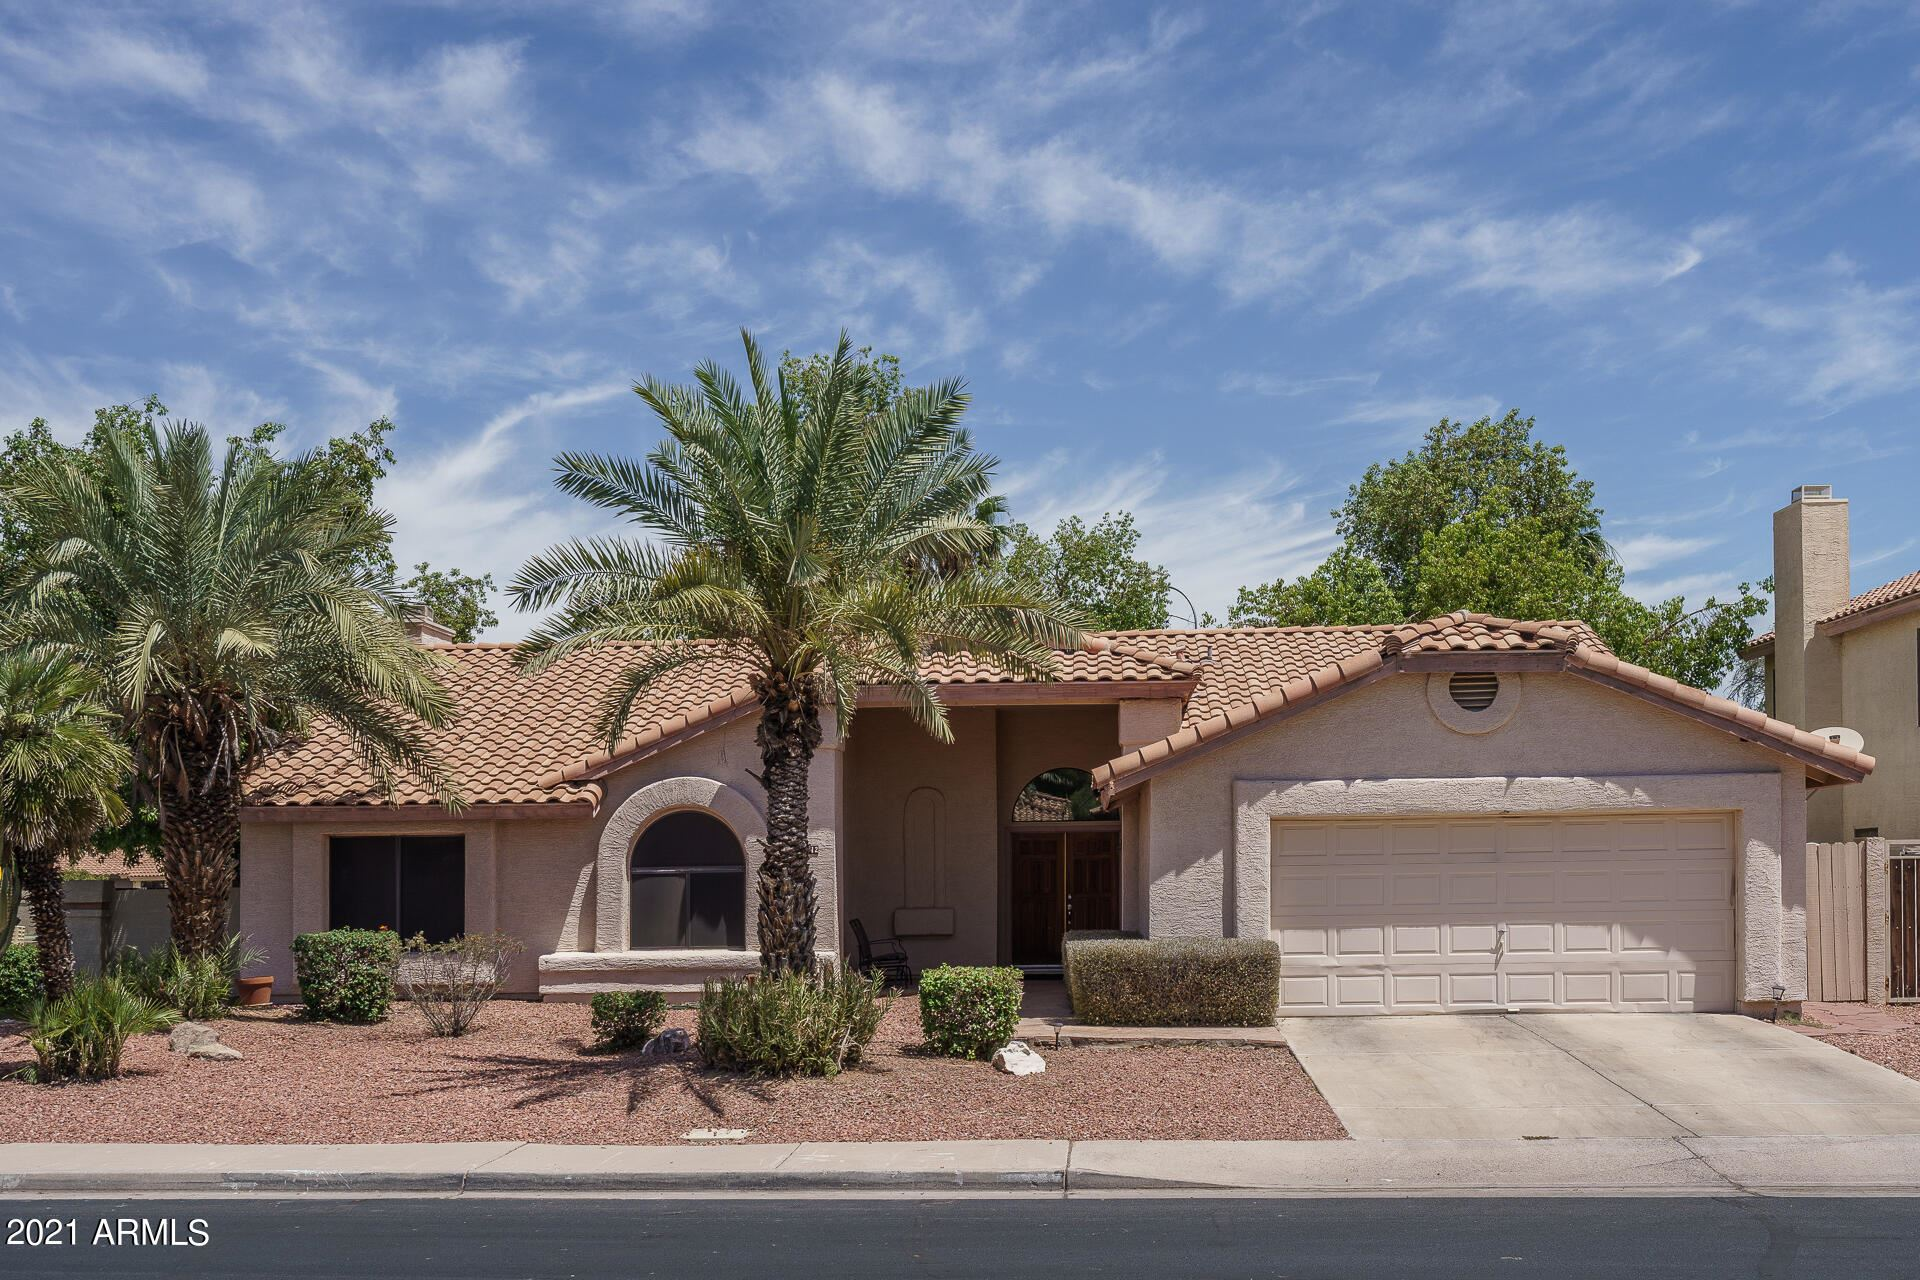 Photo of 10942 W CITRUS GROVE Way, Avondale, AZ 85392 (MLS # 6249339)